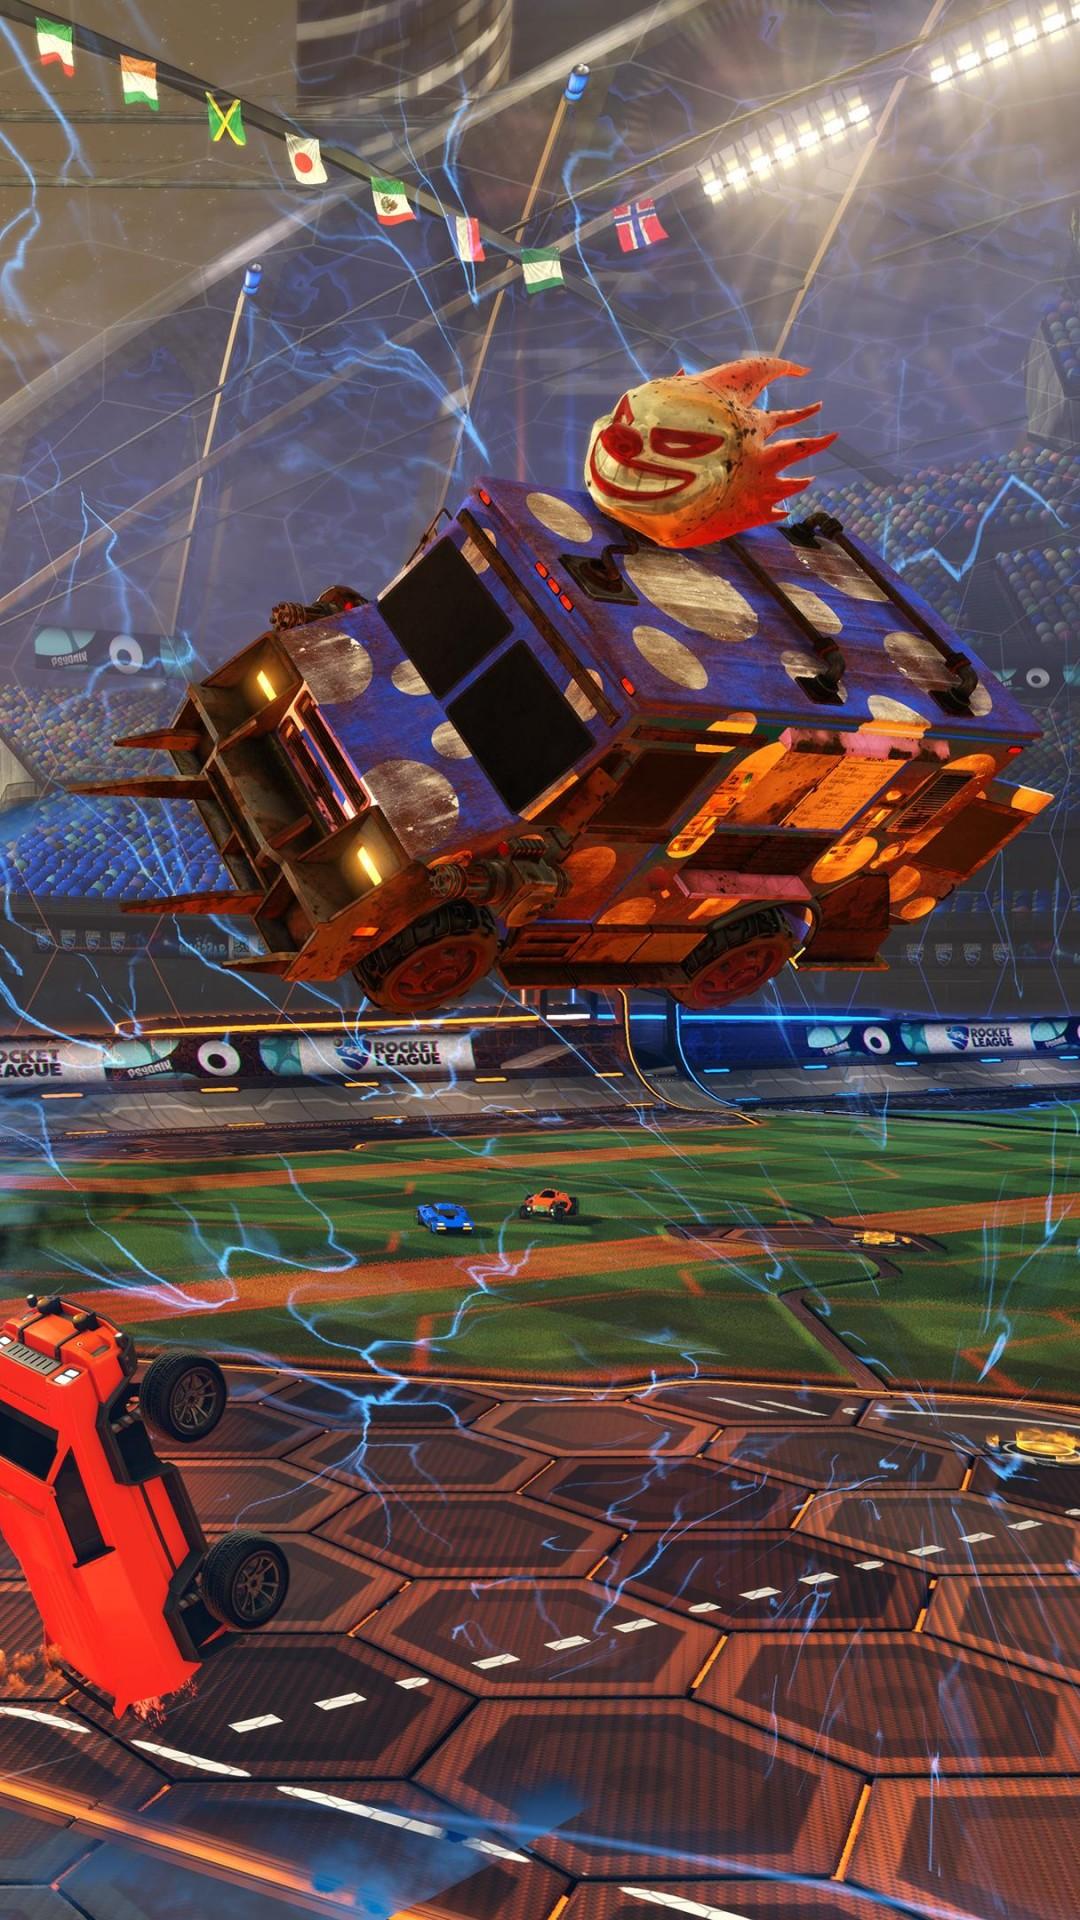 Wallpaper Rocket League Gdc Awards 2016 Pc Ps 4 Xbox